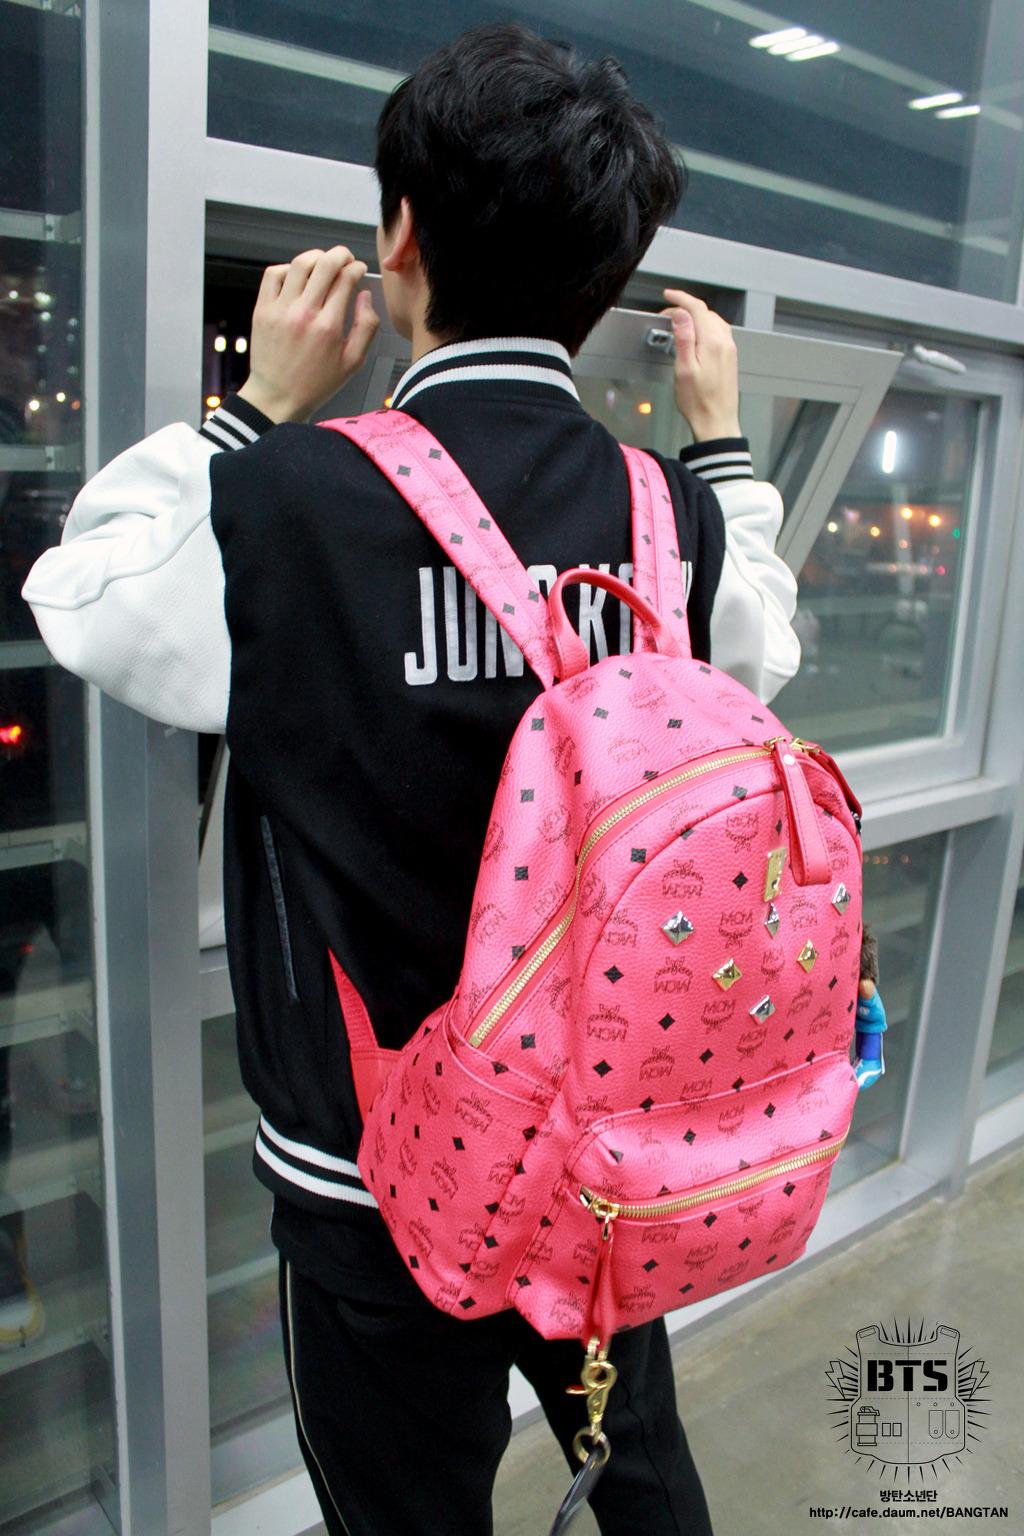 Jungkook BTS image jungkook bts 36413260 1024 1536